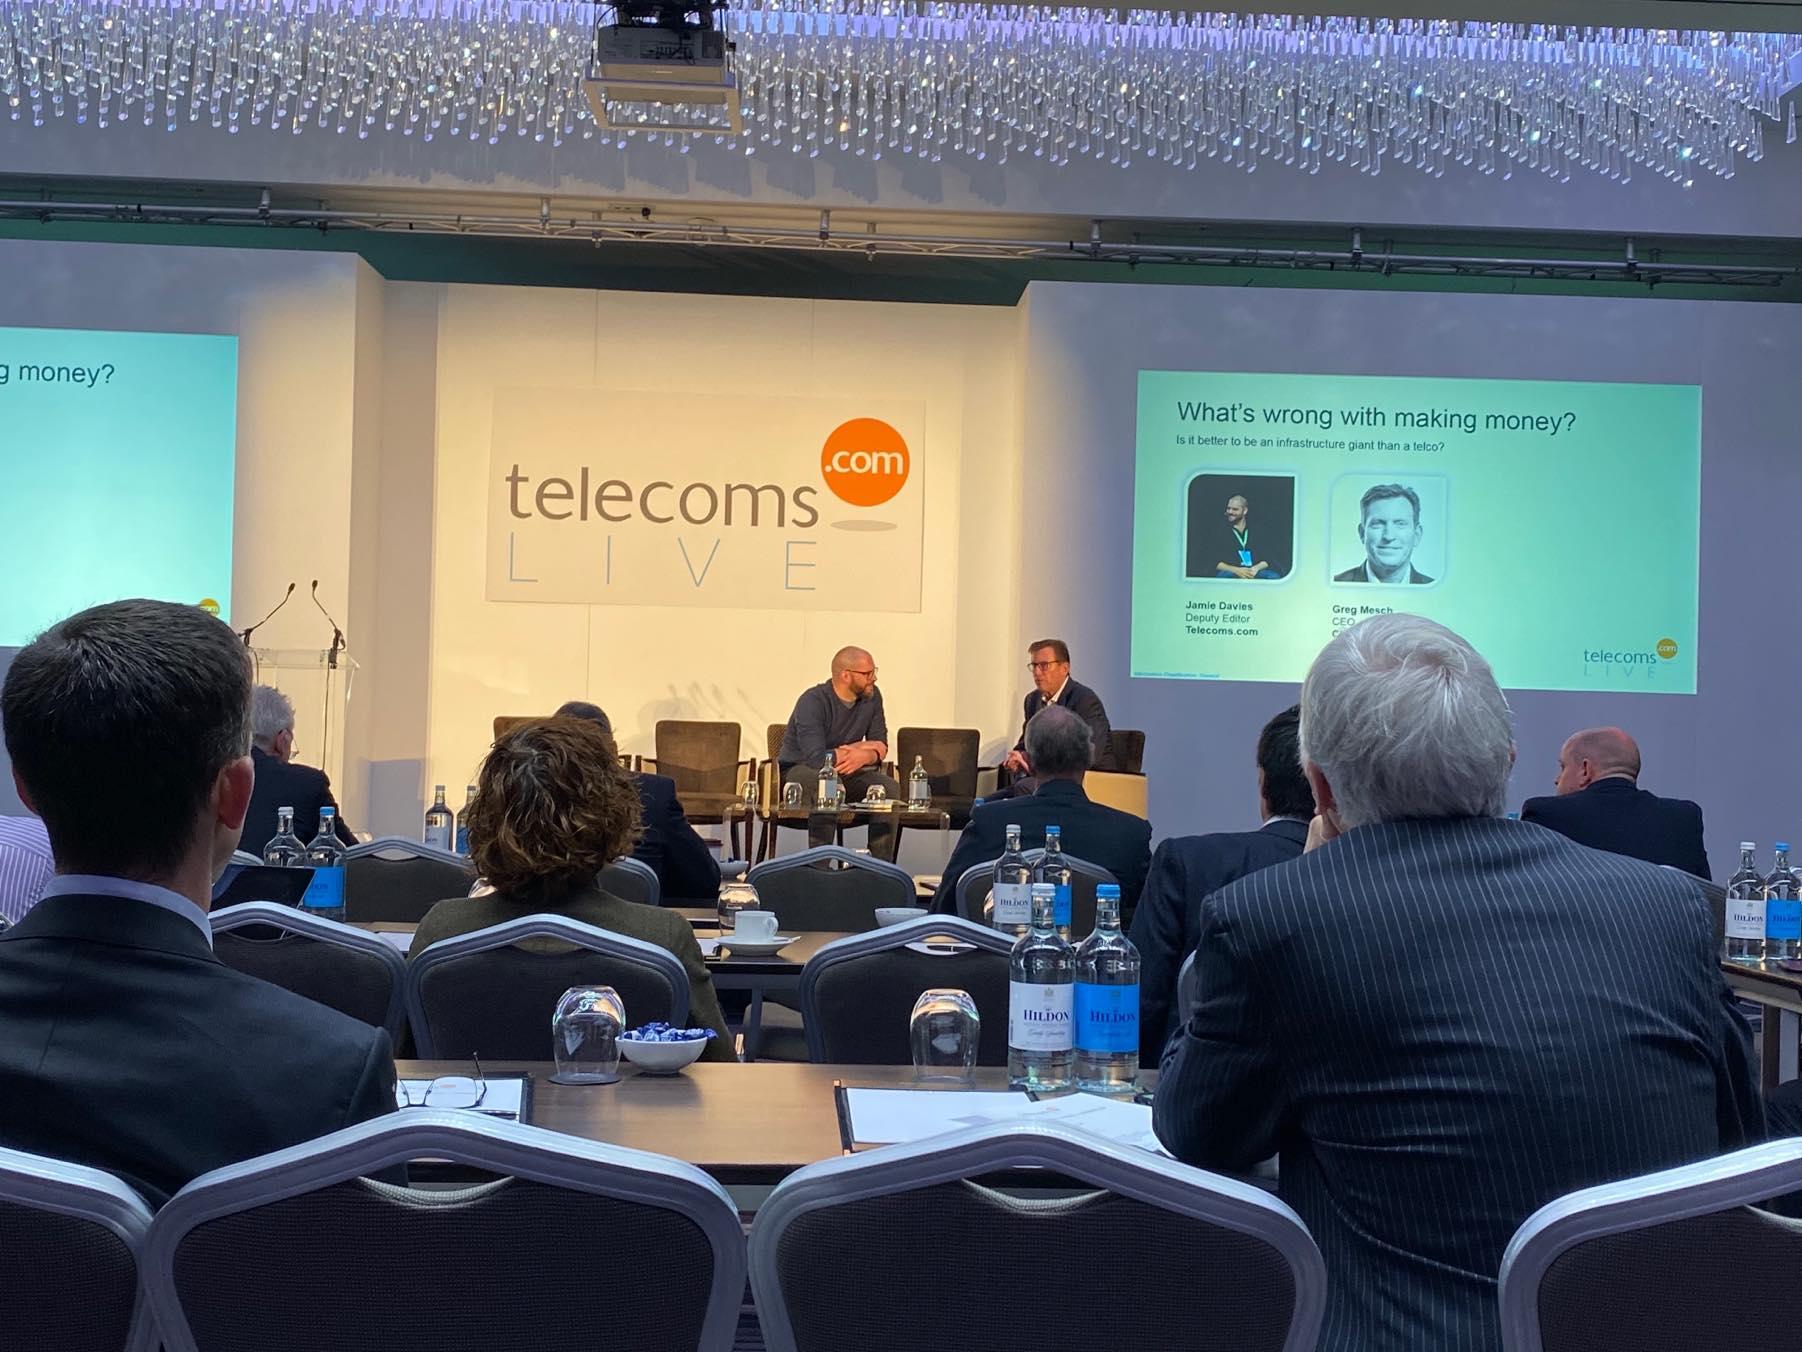 How it unfolded: Telecoms.com LIVE